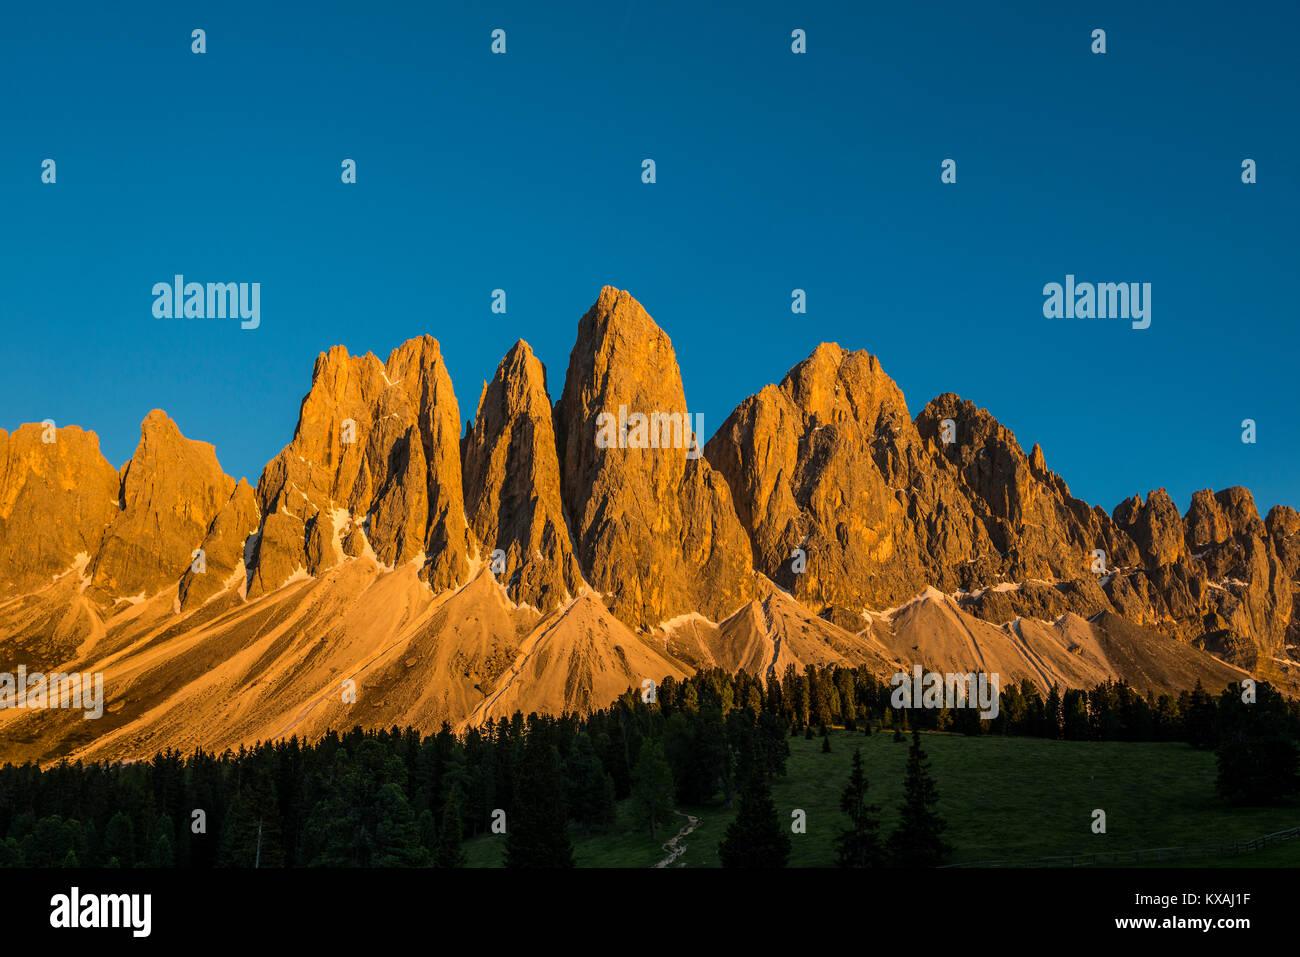 Sonnenuntergang, glühende Geislerspitzen, Villnösstal, Sass Rigais, Dolomiten, Südtirol, Italien Stockbild